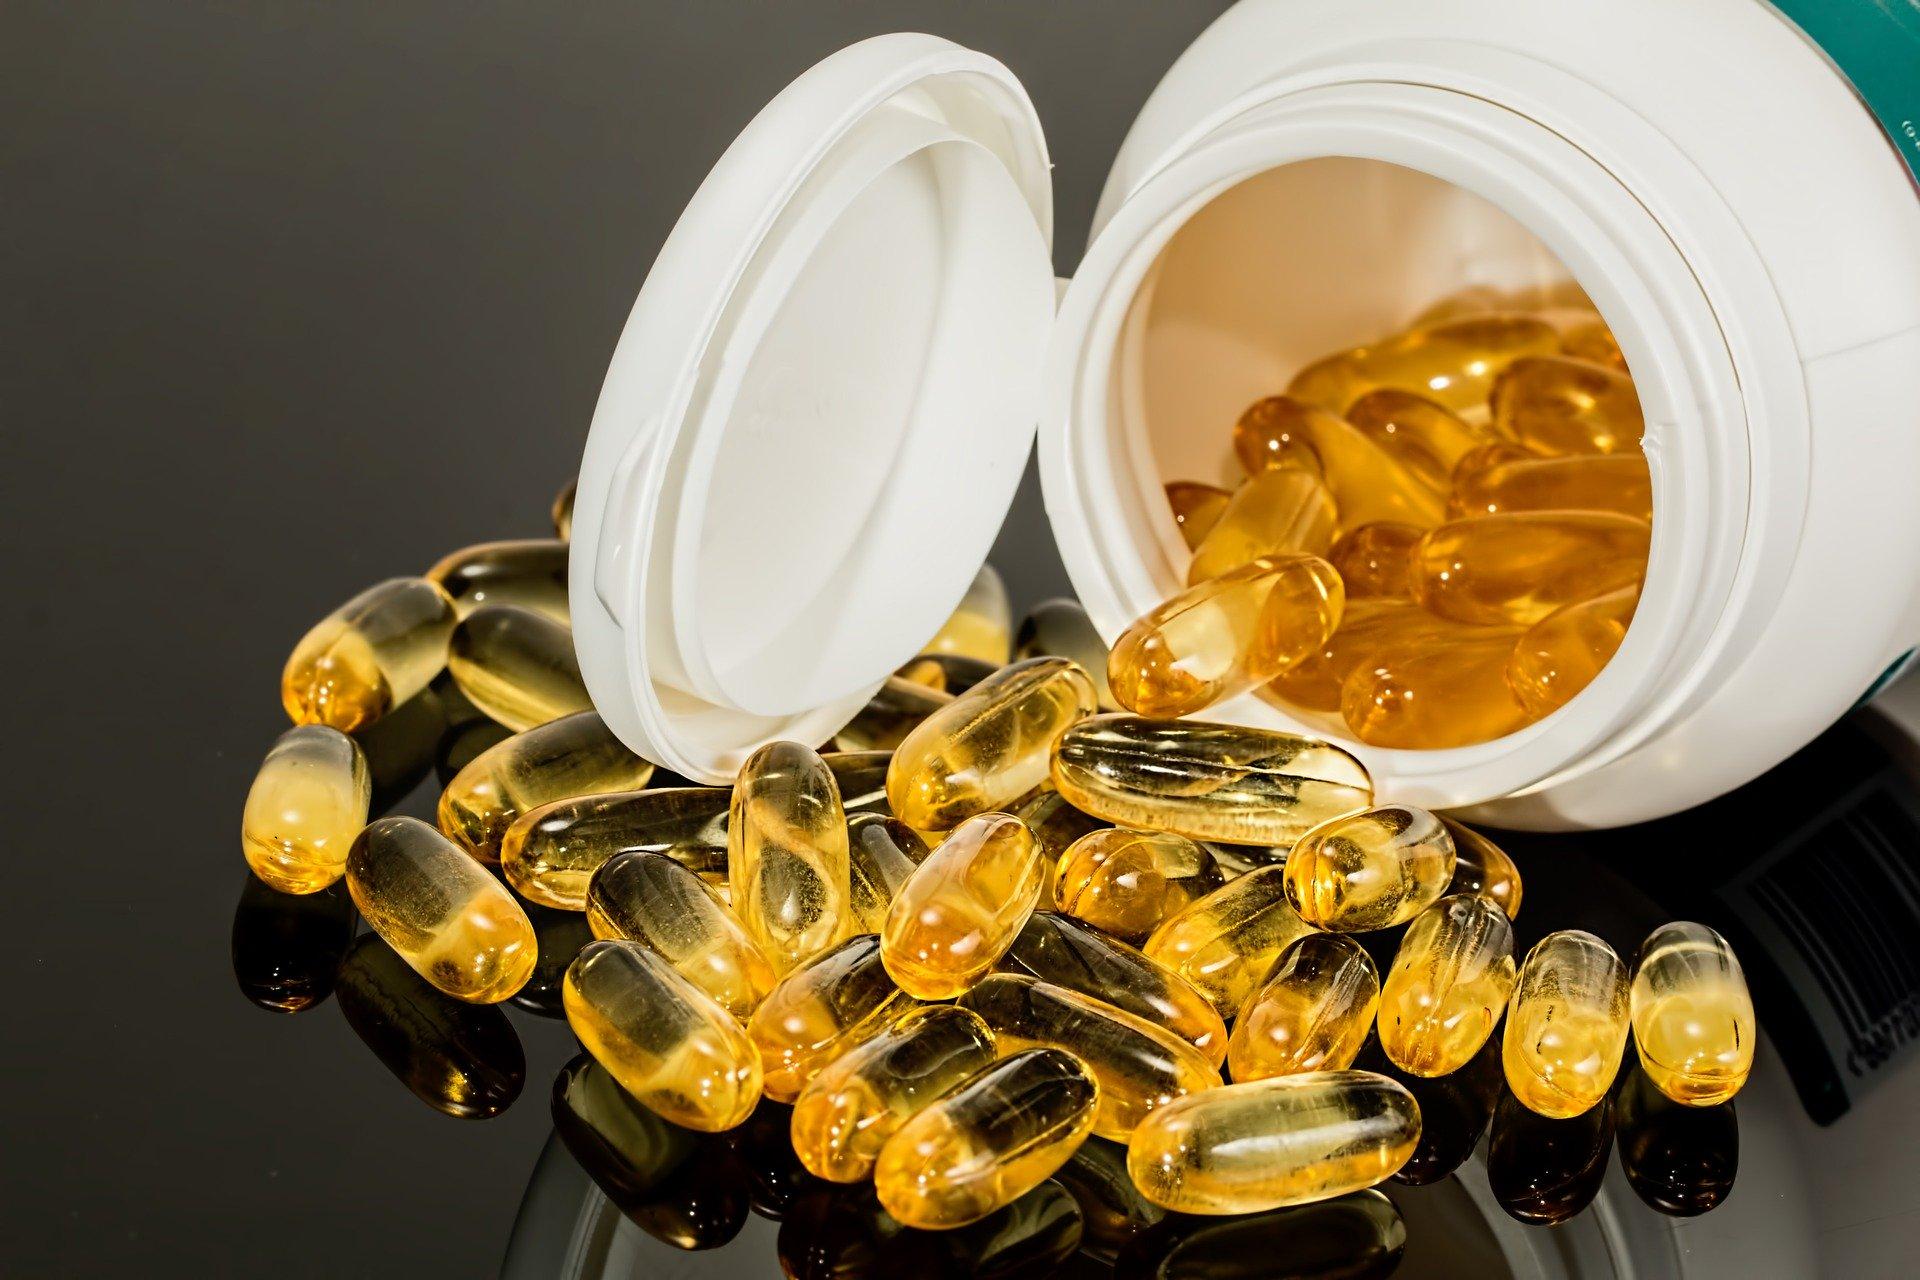 The effect of omega-3 on inhibiting inflammation DHA vs EPA vs ALA